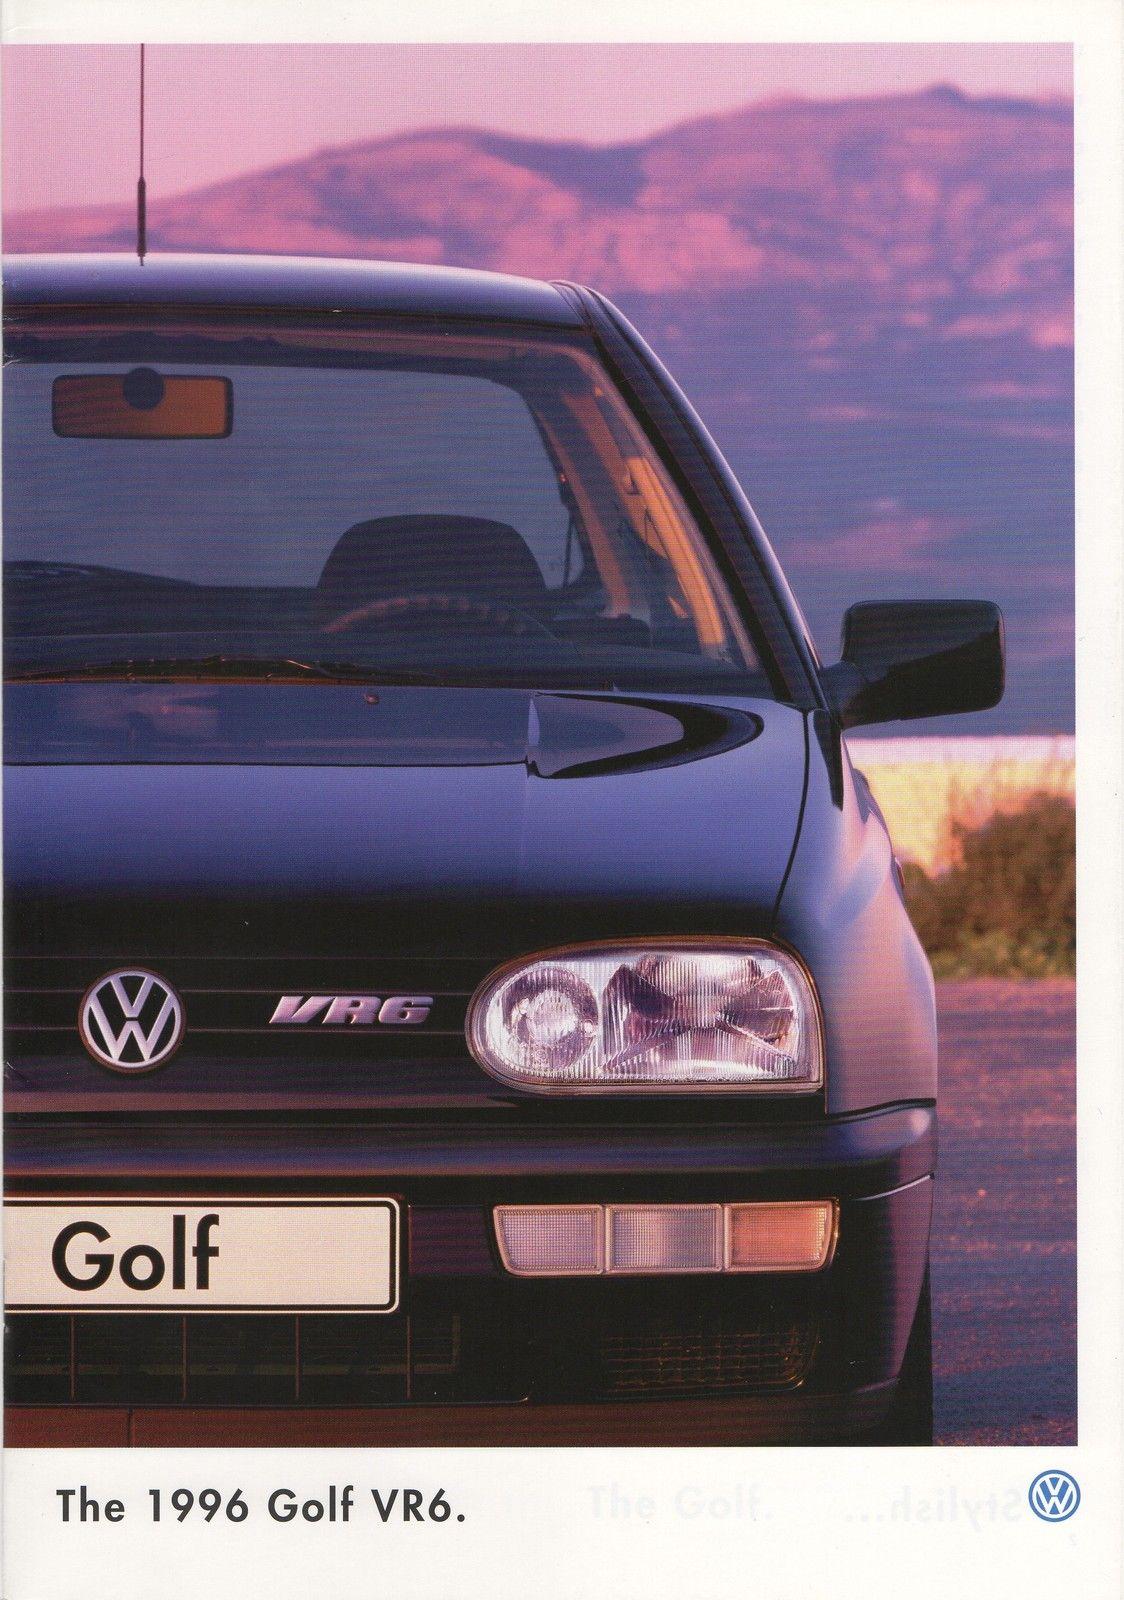 volkswagen golf iii vr6 brochure echoretro. Black Bedroom Furniture Sets. Home Design Ideas